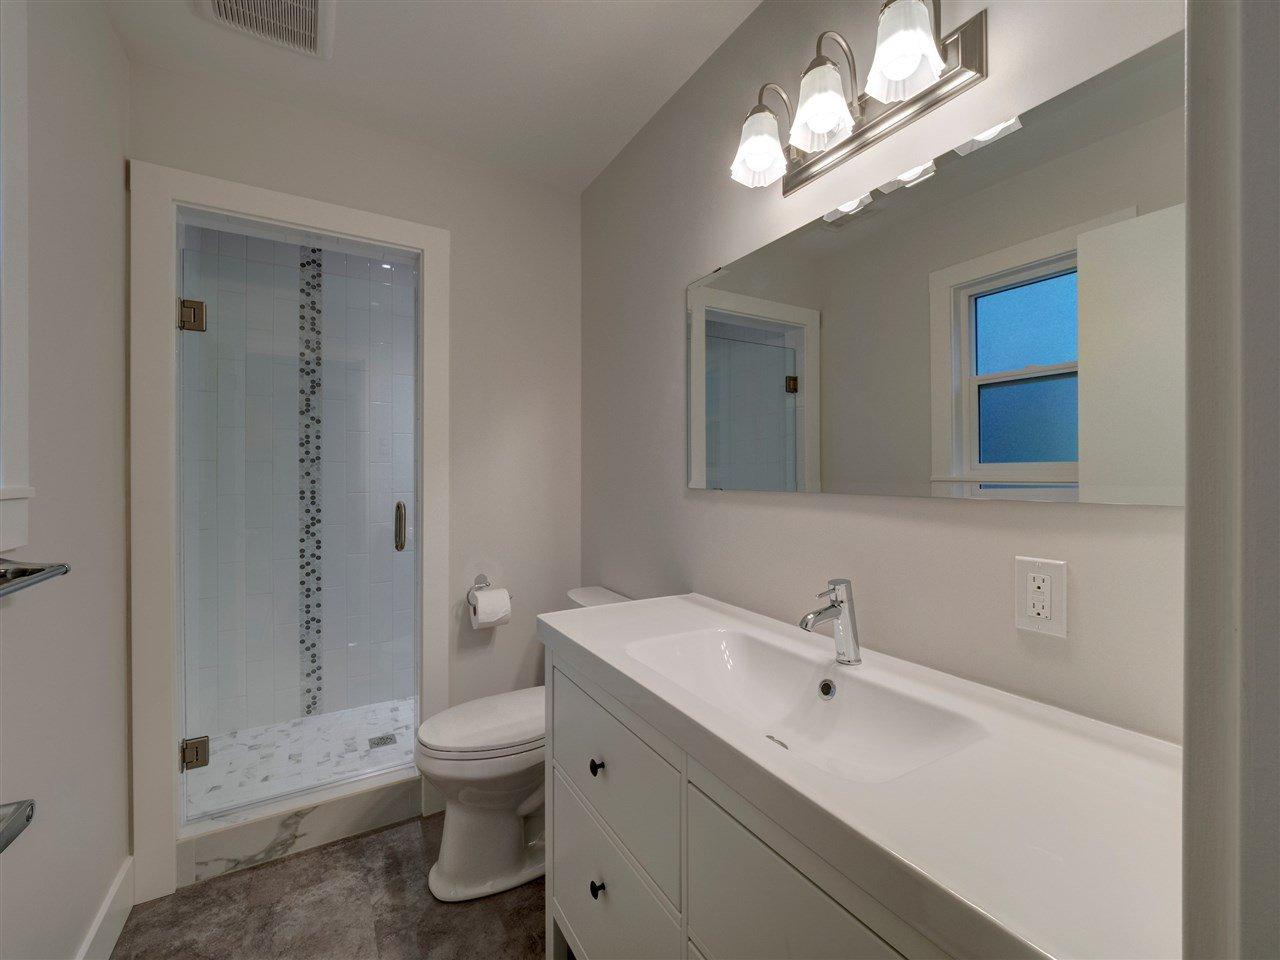 Photo 14: Photos: 1085 ROBERTS CREEK Road: Roberts Creek House for sale (Sunshine Coast)  : MLS®# R2392415